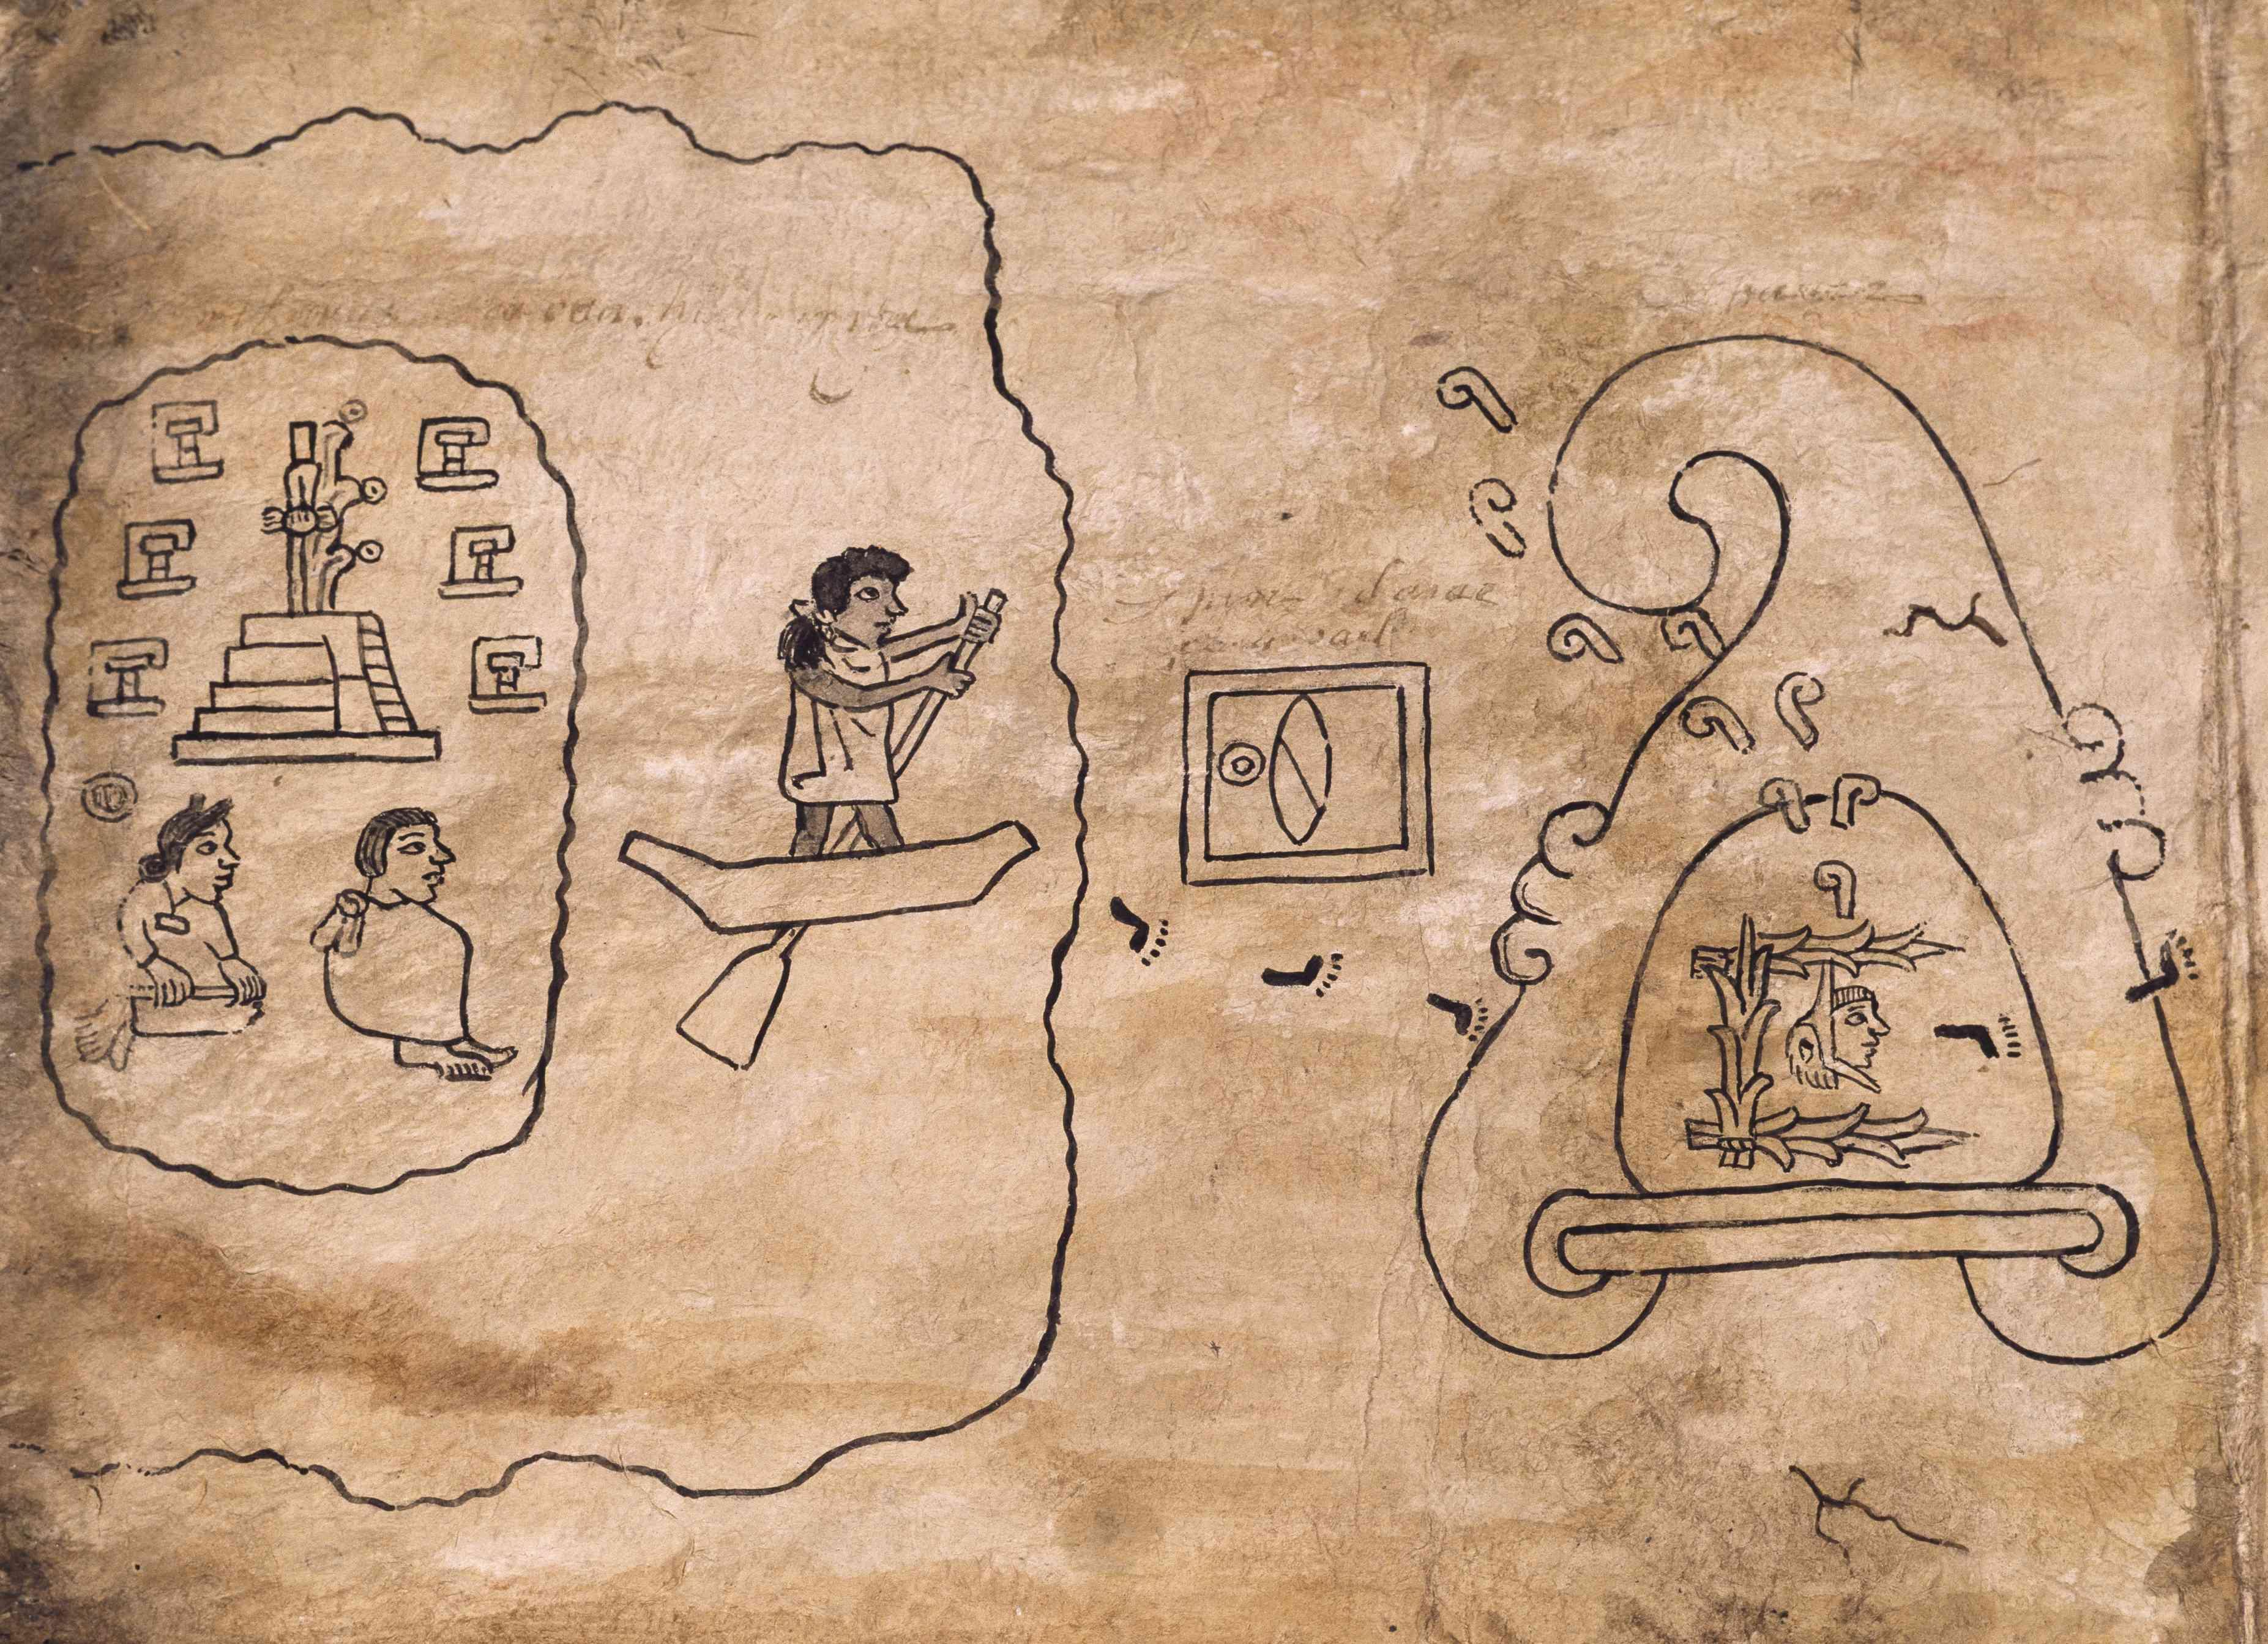 Migration of Aztecs to Tenochtitlan, drawing from Boturini Codex manuscript, Mexico, 16th century